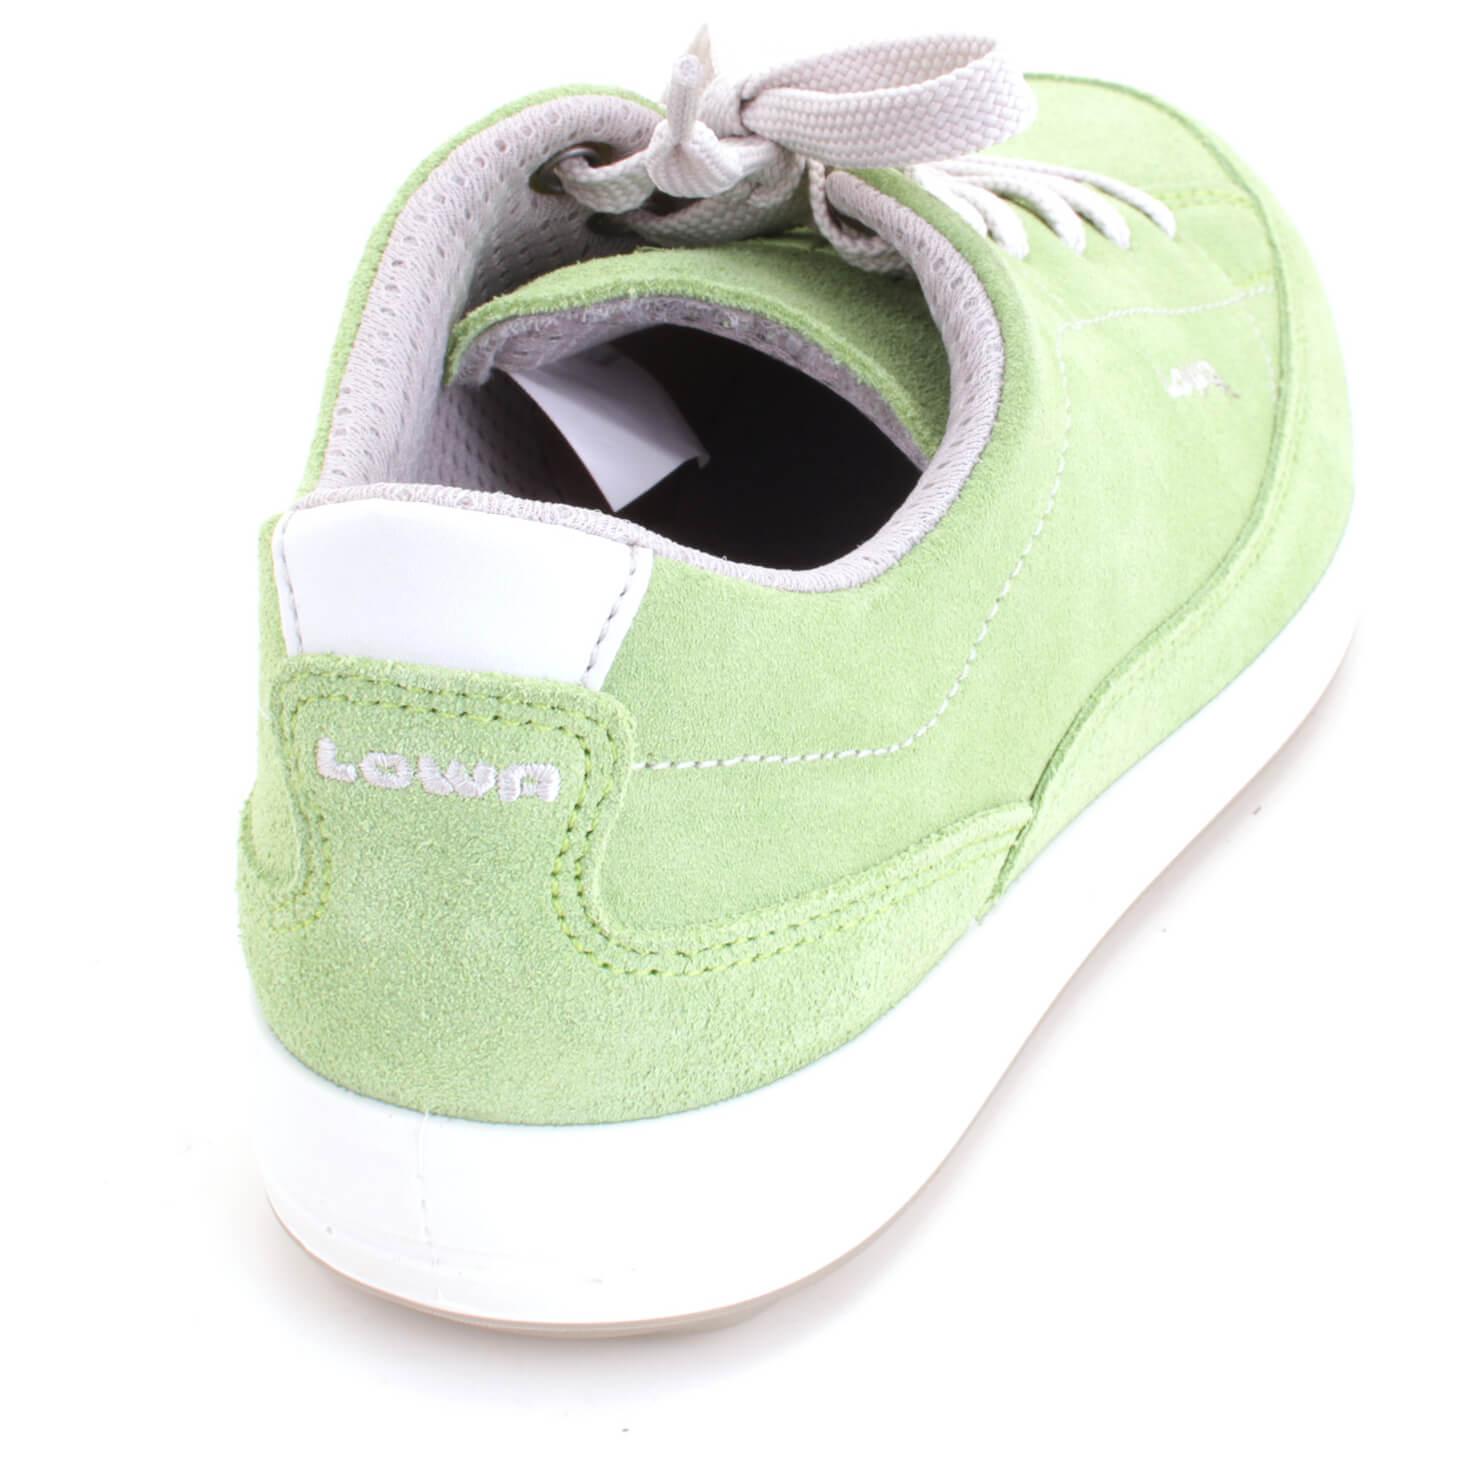 d985581b5e Lowa Palermo - Sneakers Dames online kopen